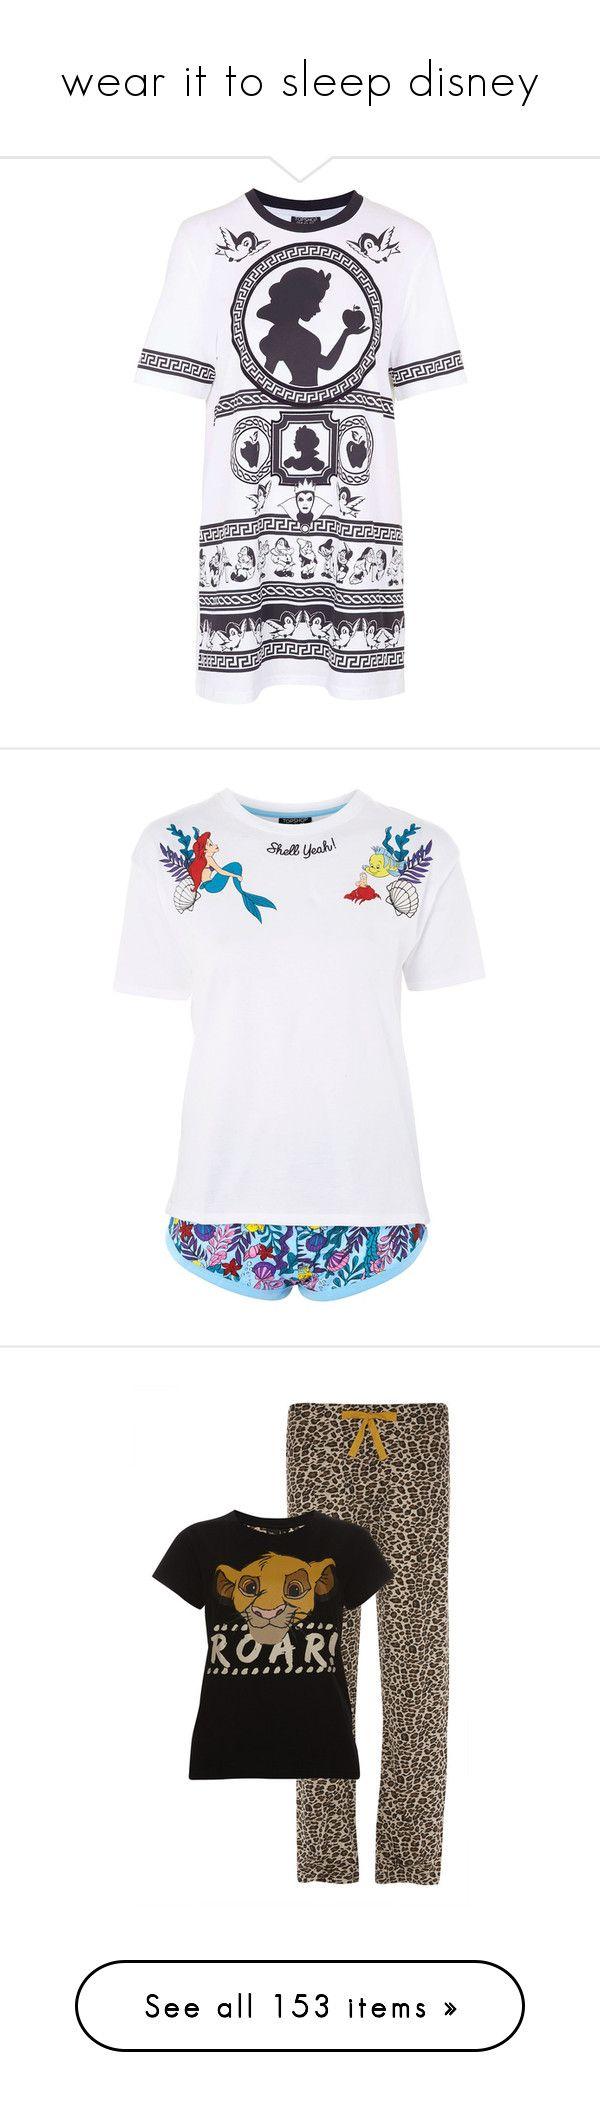 """wear it to sleep disney"" by basicstarks ❤ liked on Polyvore featuring intimates, sleepwear, pajamas, dresses, white, long pajamas, white pjs, topshop pjs, white pajamas and topshop pyjamas"